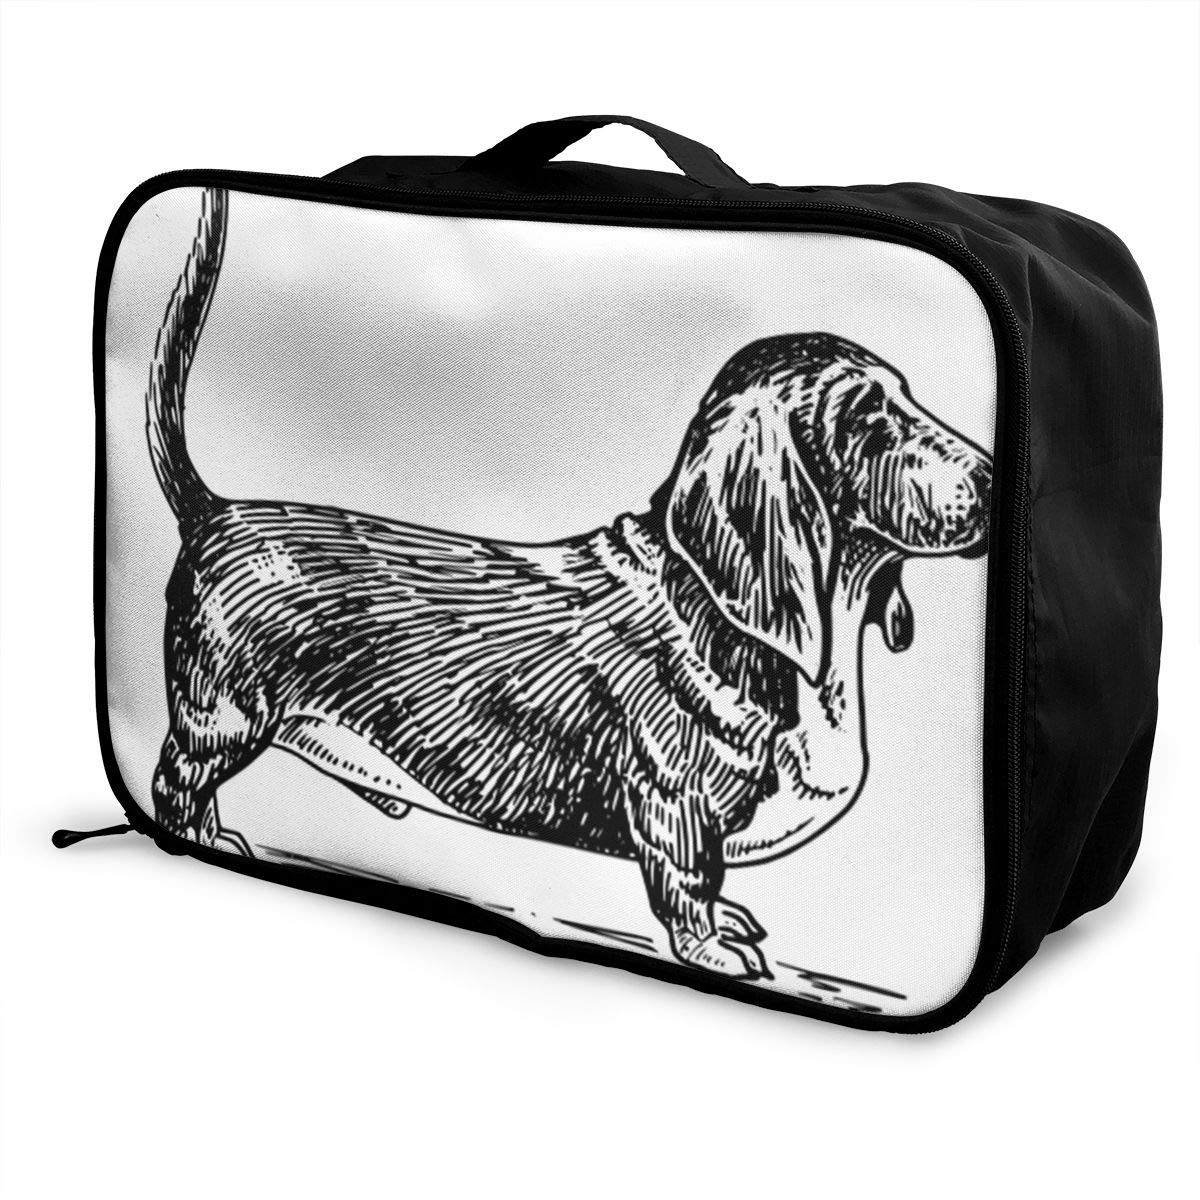 ADGAI Dog with Big Ears Canvas Travel Weekender Bag,Fashion Custom Lightweight Large Capacity Portable Luggage Bag,Suitcase Trolley Bag